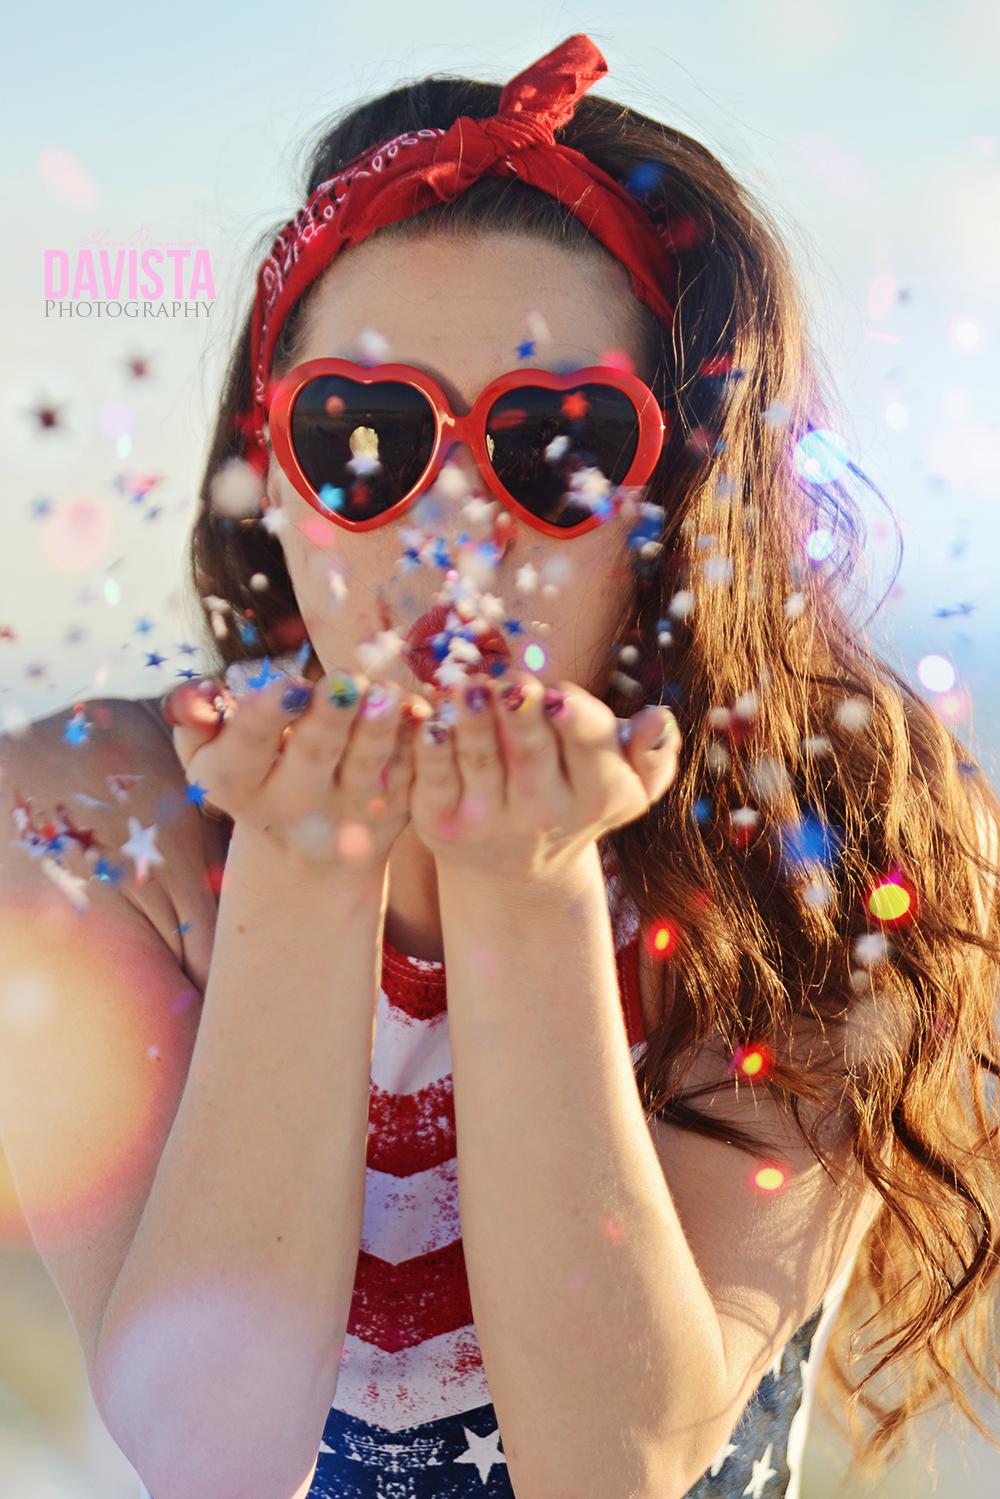 cute confetti blowing alamogordo photography